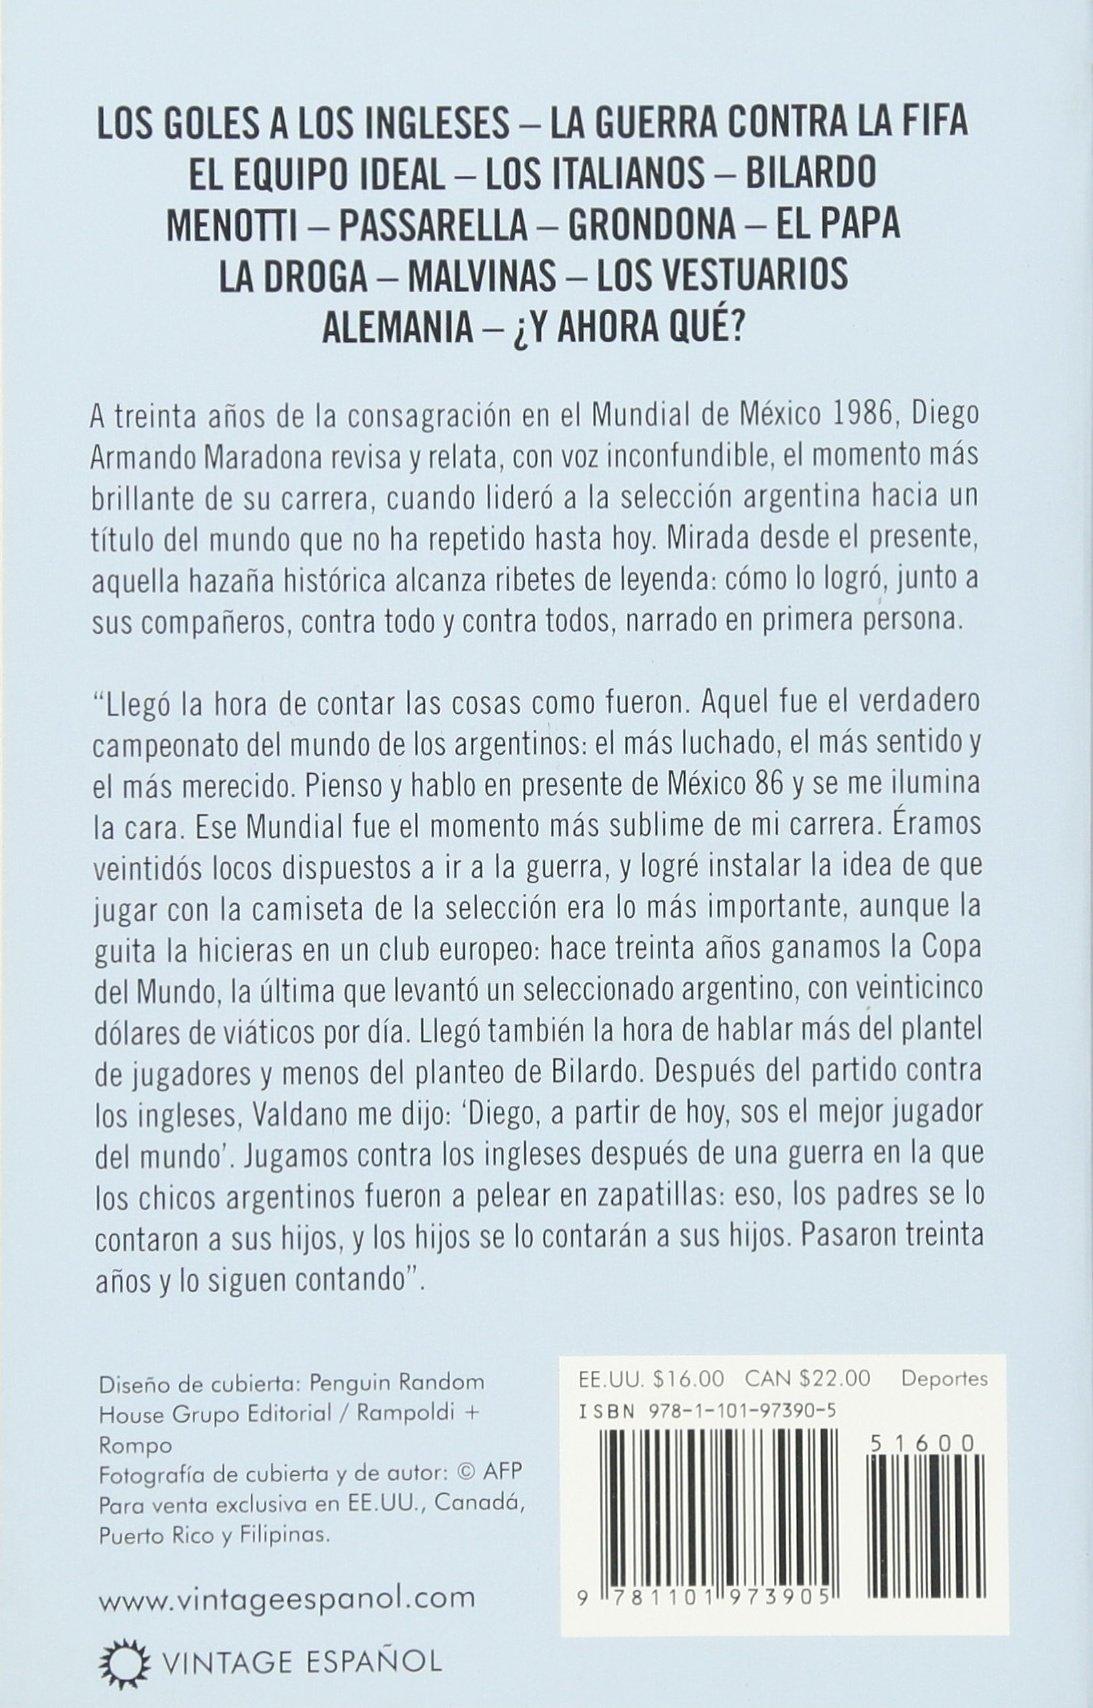 Mexico 86: Así ganamos la copa (Spanish Edition): Diego Armando Maradona: 9781101973905: Amazon.com: Books